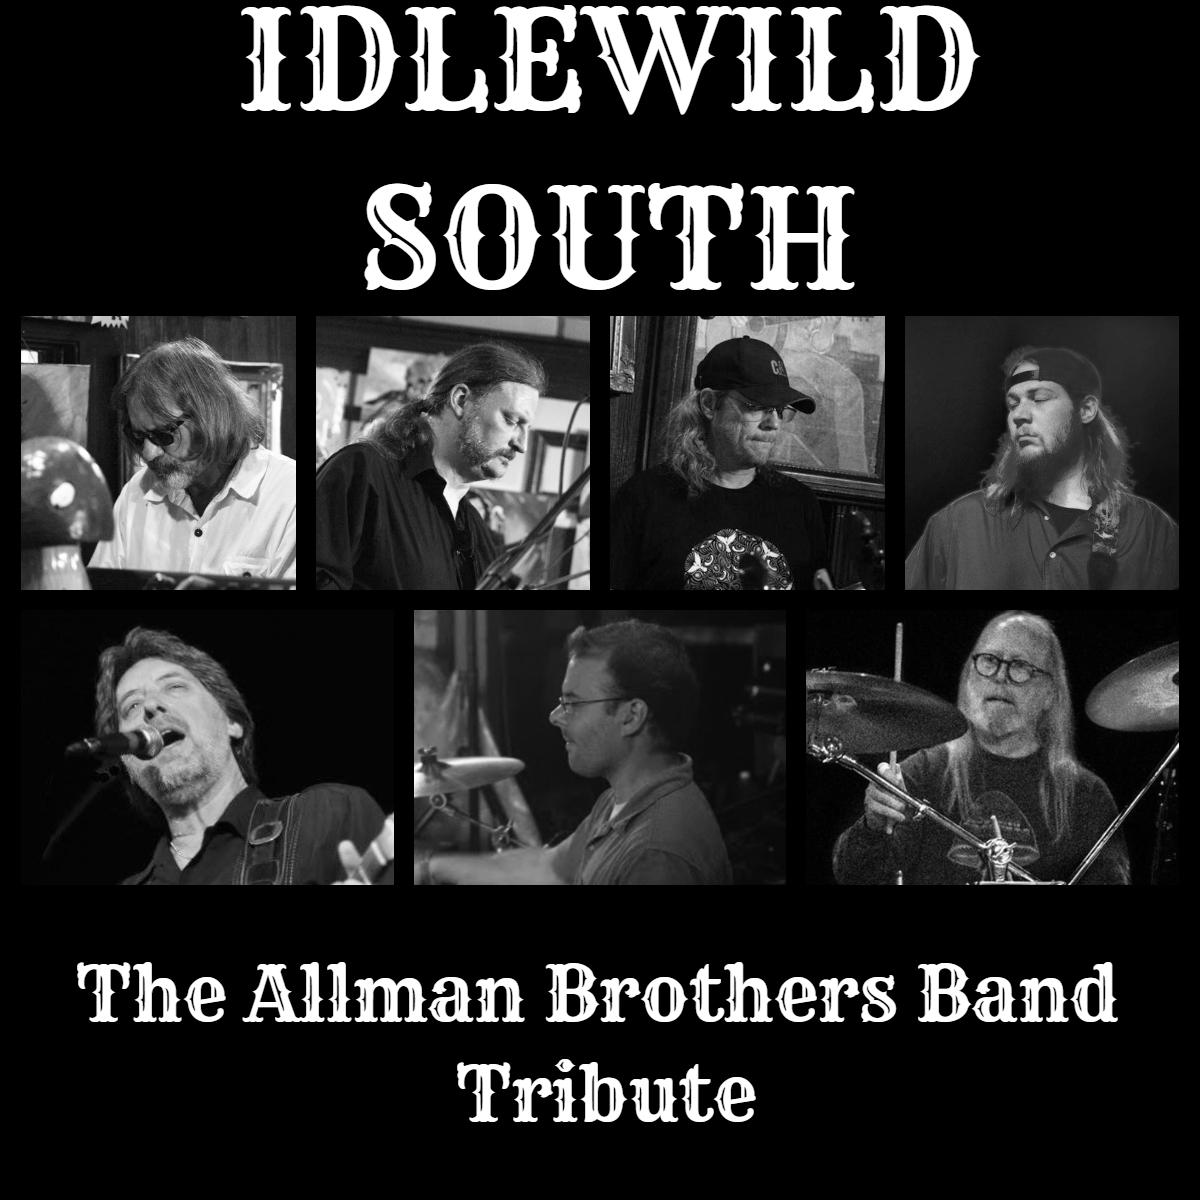 Idlewild South – Postponed